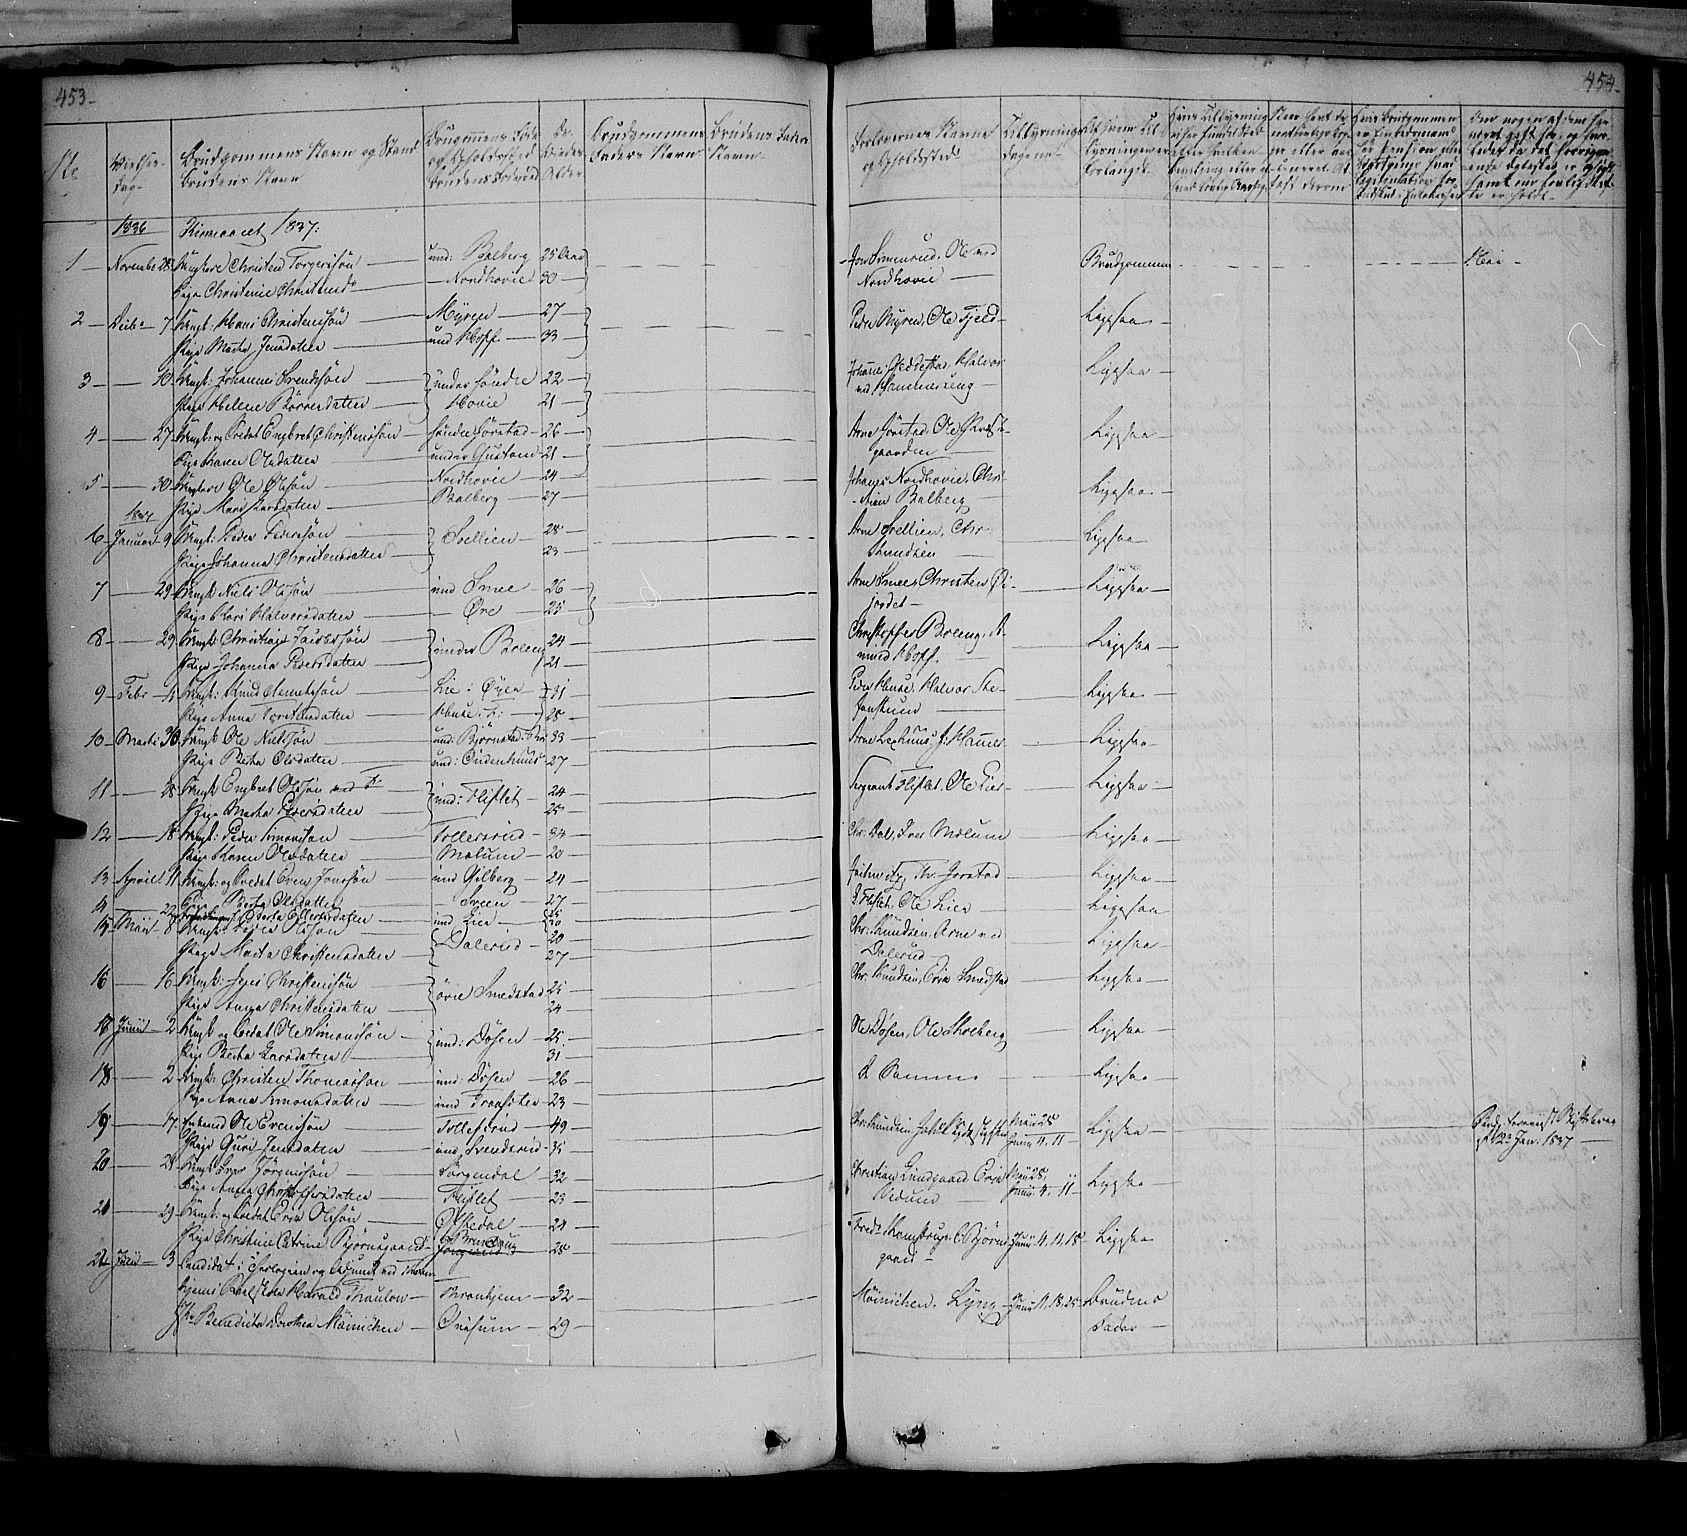 SAH, Fåberg prestekontor, Ministerialbok nr. 5, 1836-1854, s. 453-454